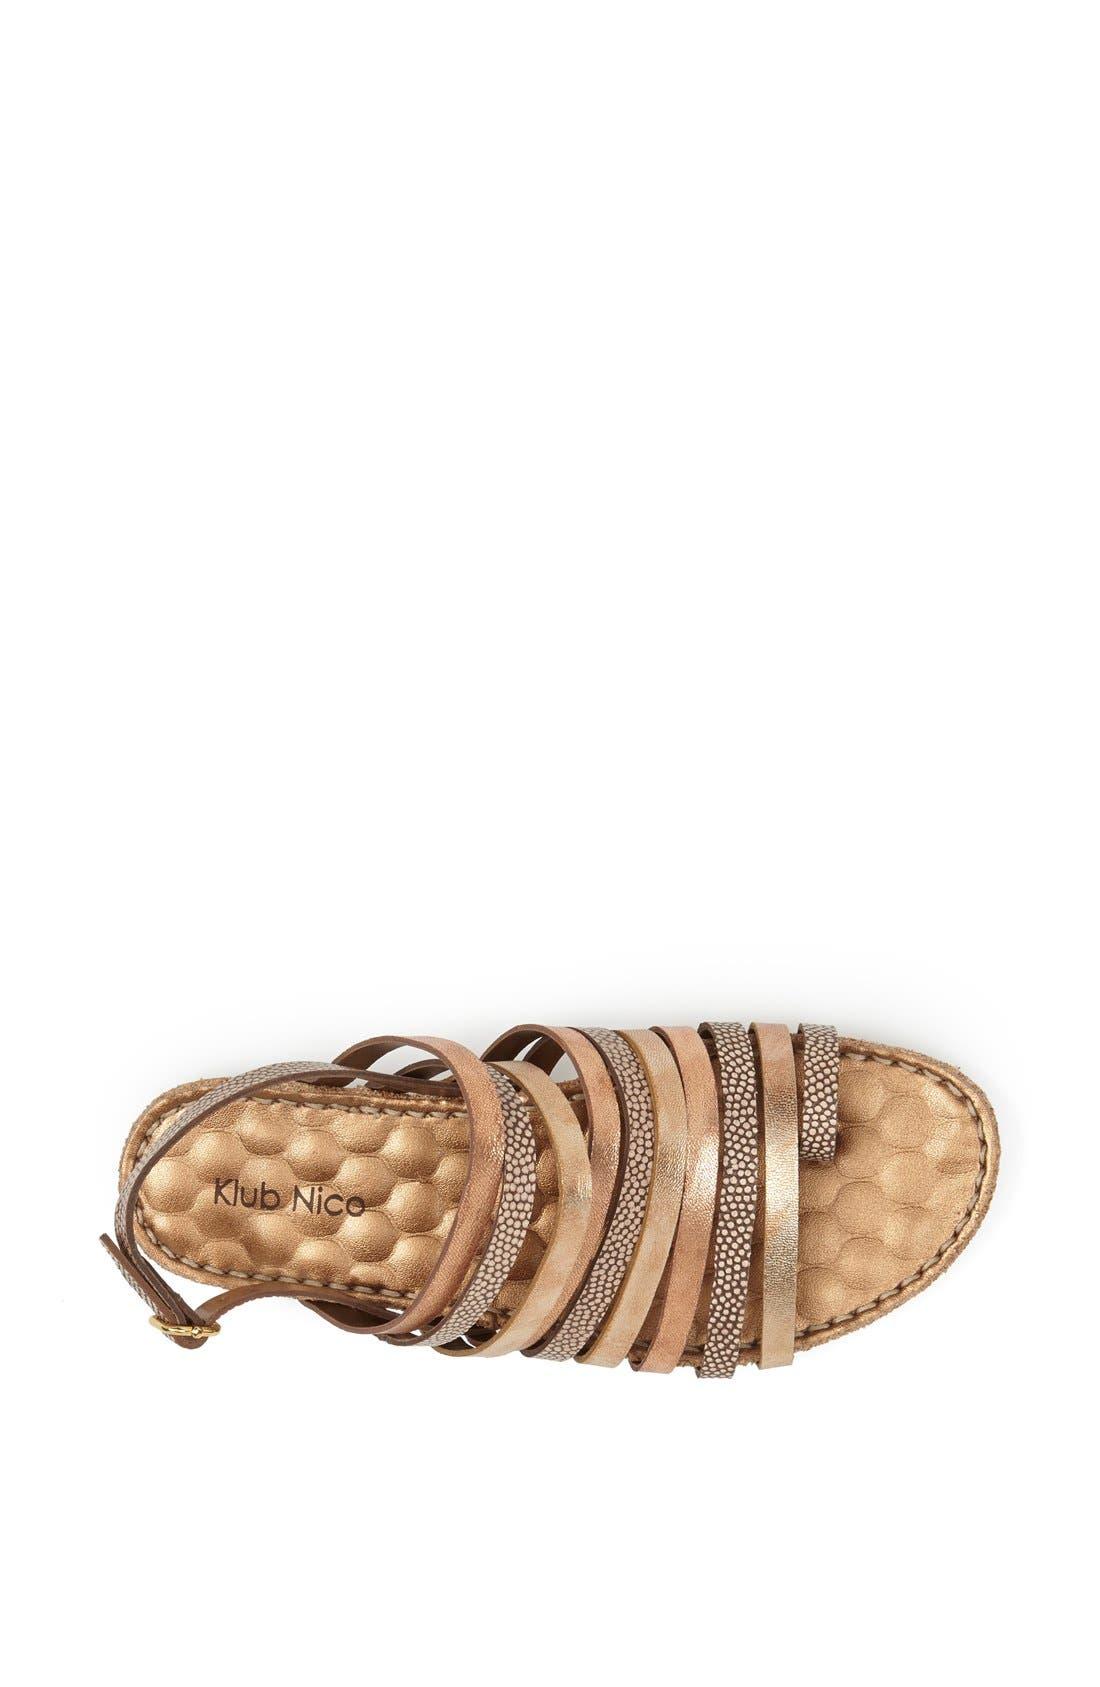 Alternate Image 3  - Klub Nico 'Gilly' Sandal